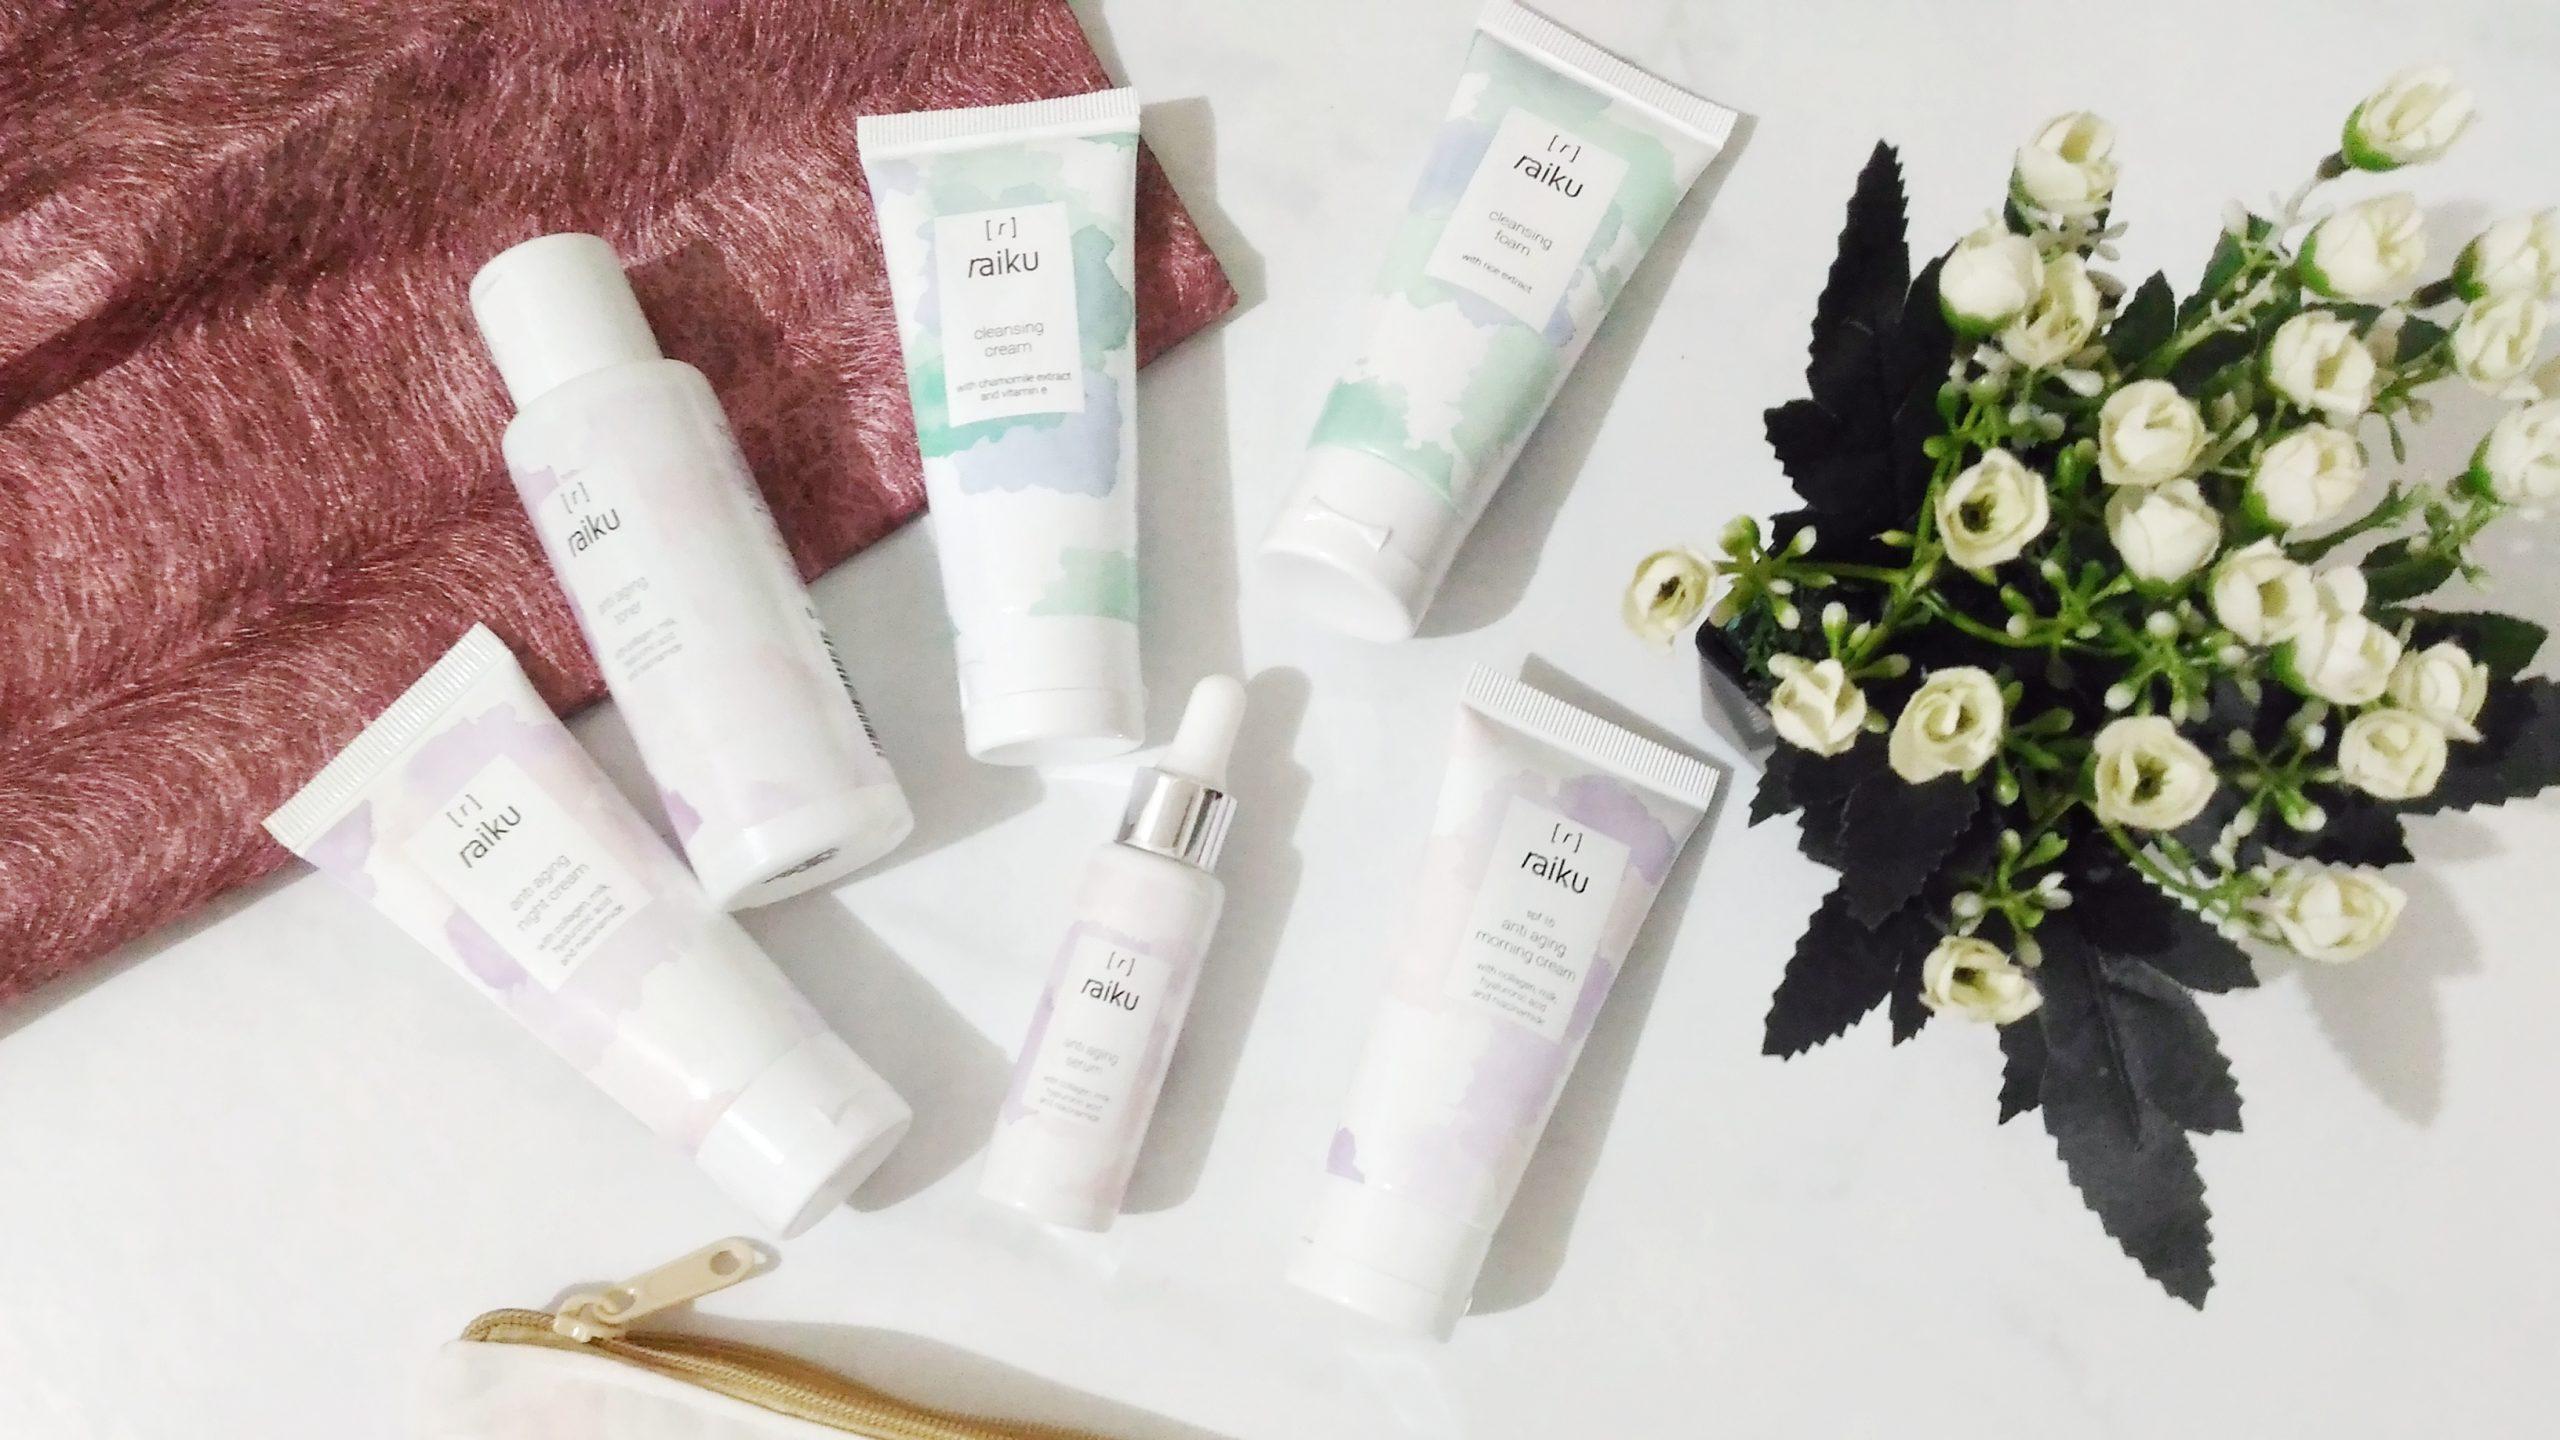 p 20181019 233309 02 scaled Review Raiku Beauty Anti Aging Skincare Series